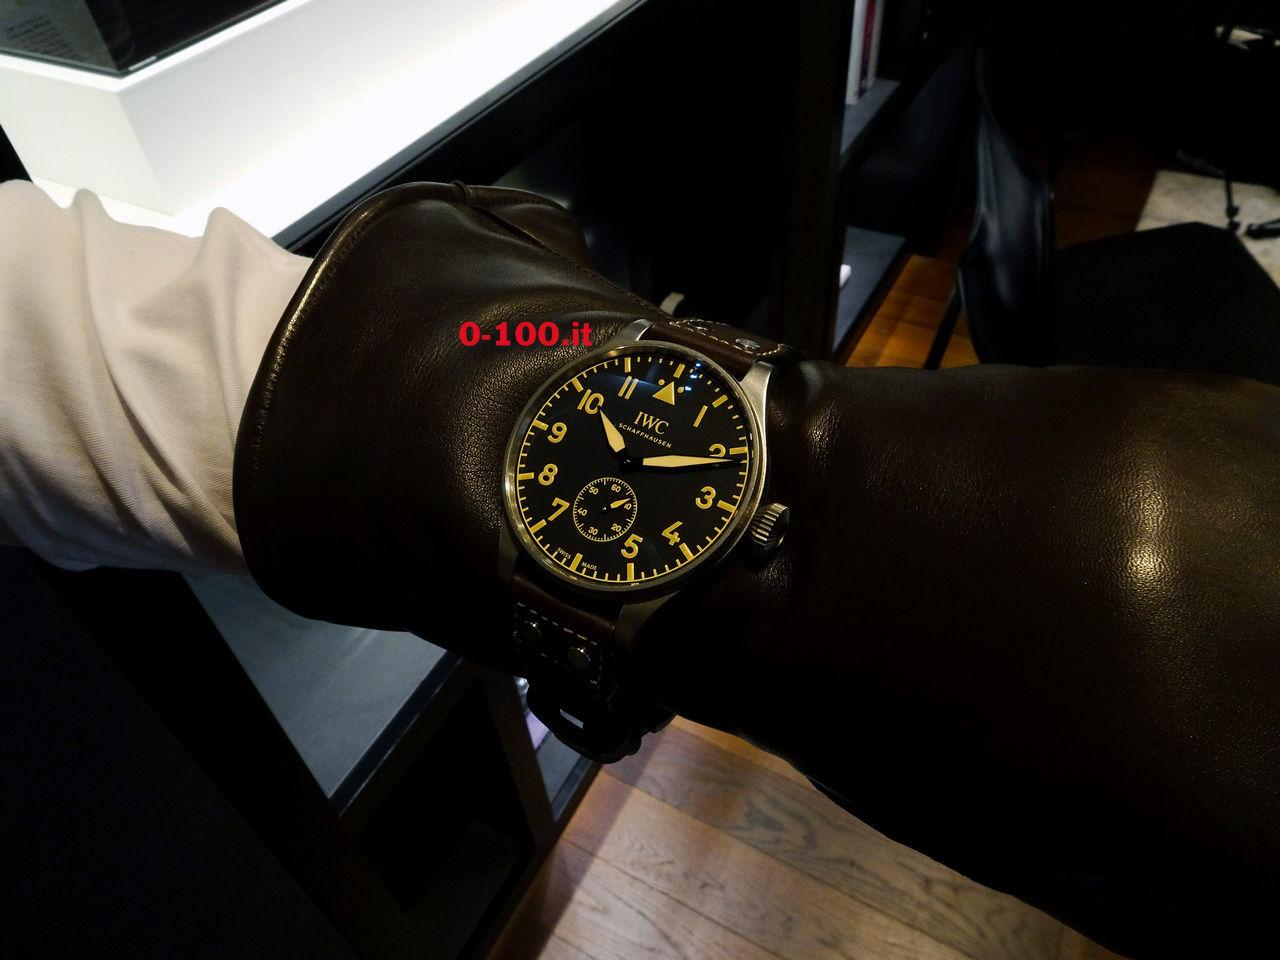 IWC_pilot_heritage-55-prezzo-price-0-100_7